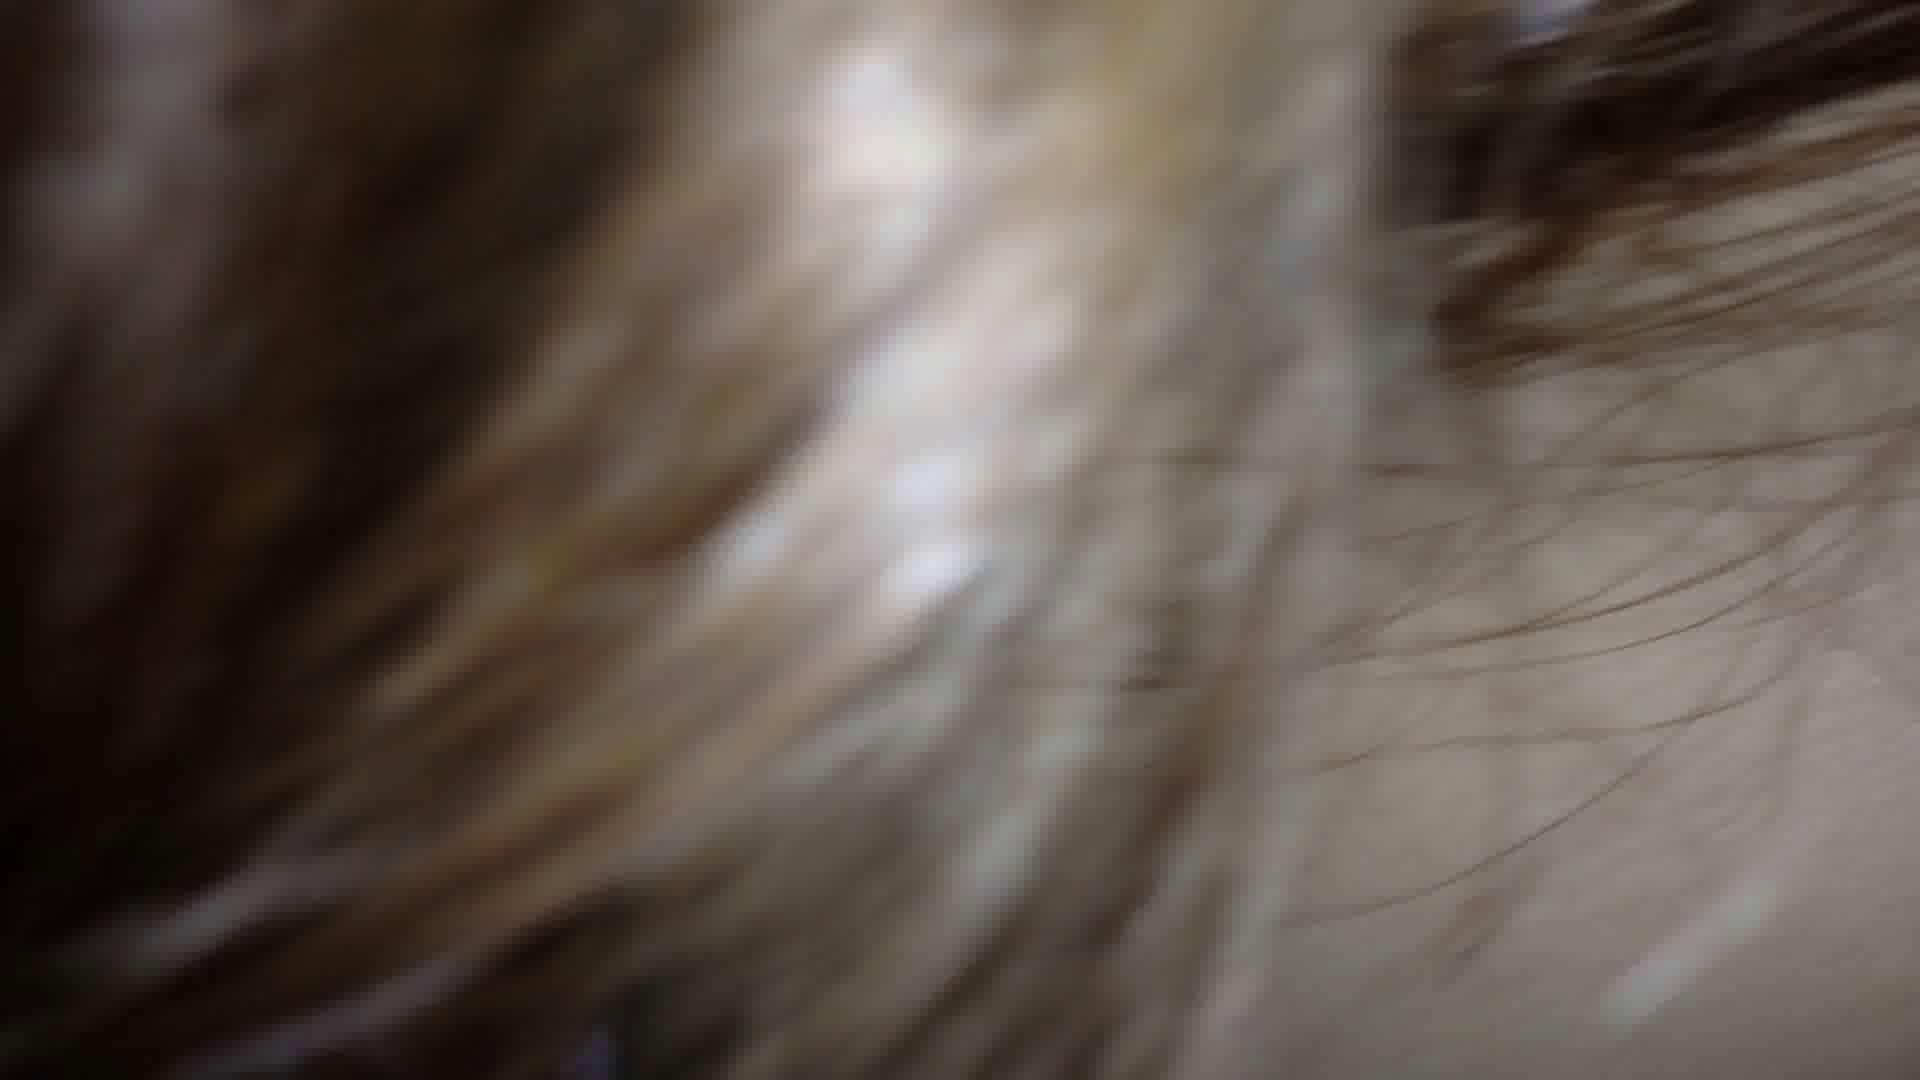 vol.45 【YMちゃん】現役JD純白パンツのお嬢様 チラ見 ワレメ動画紹介 104枚 98